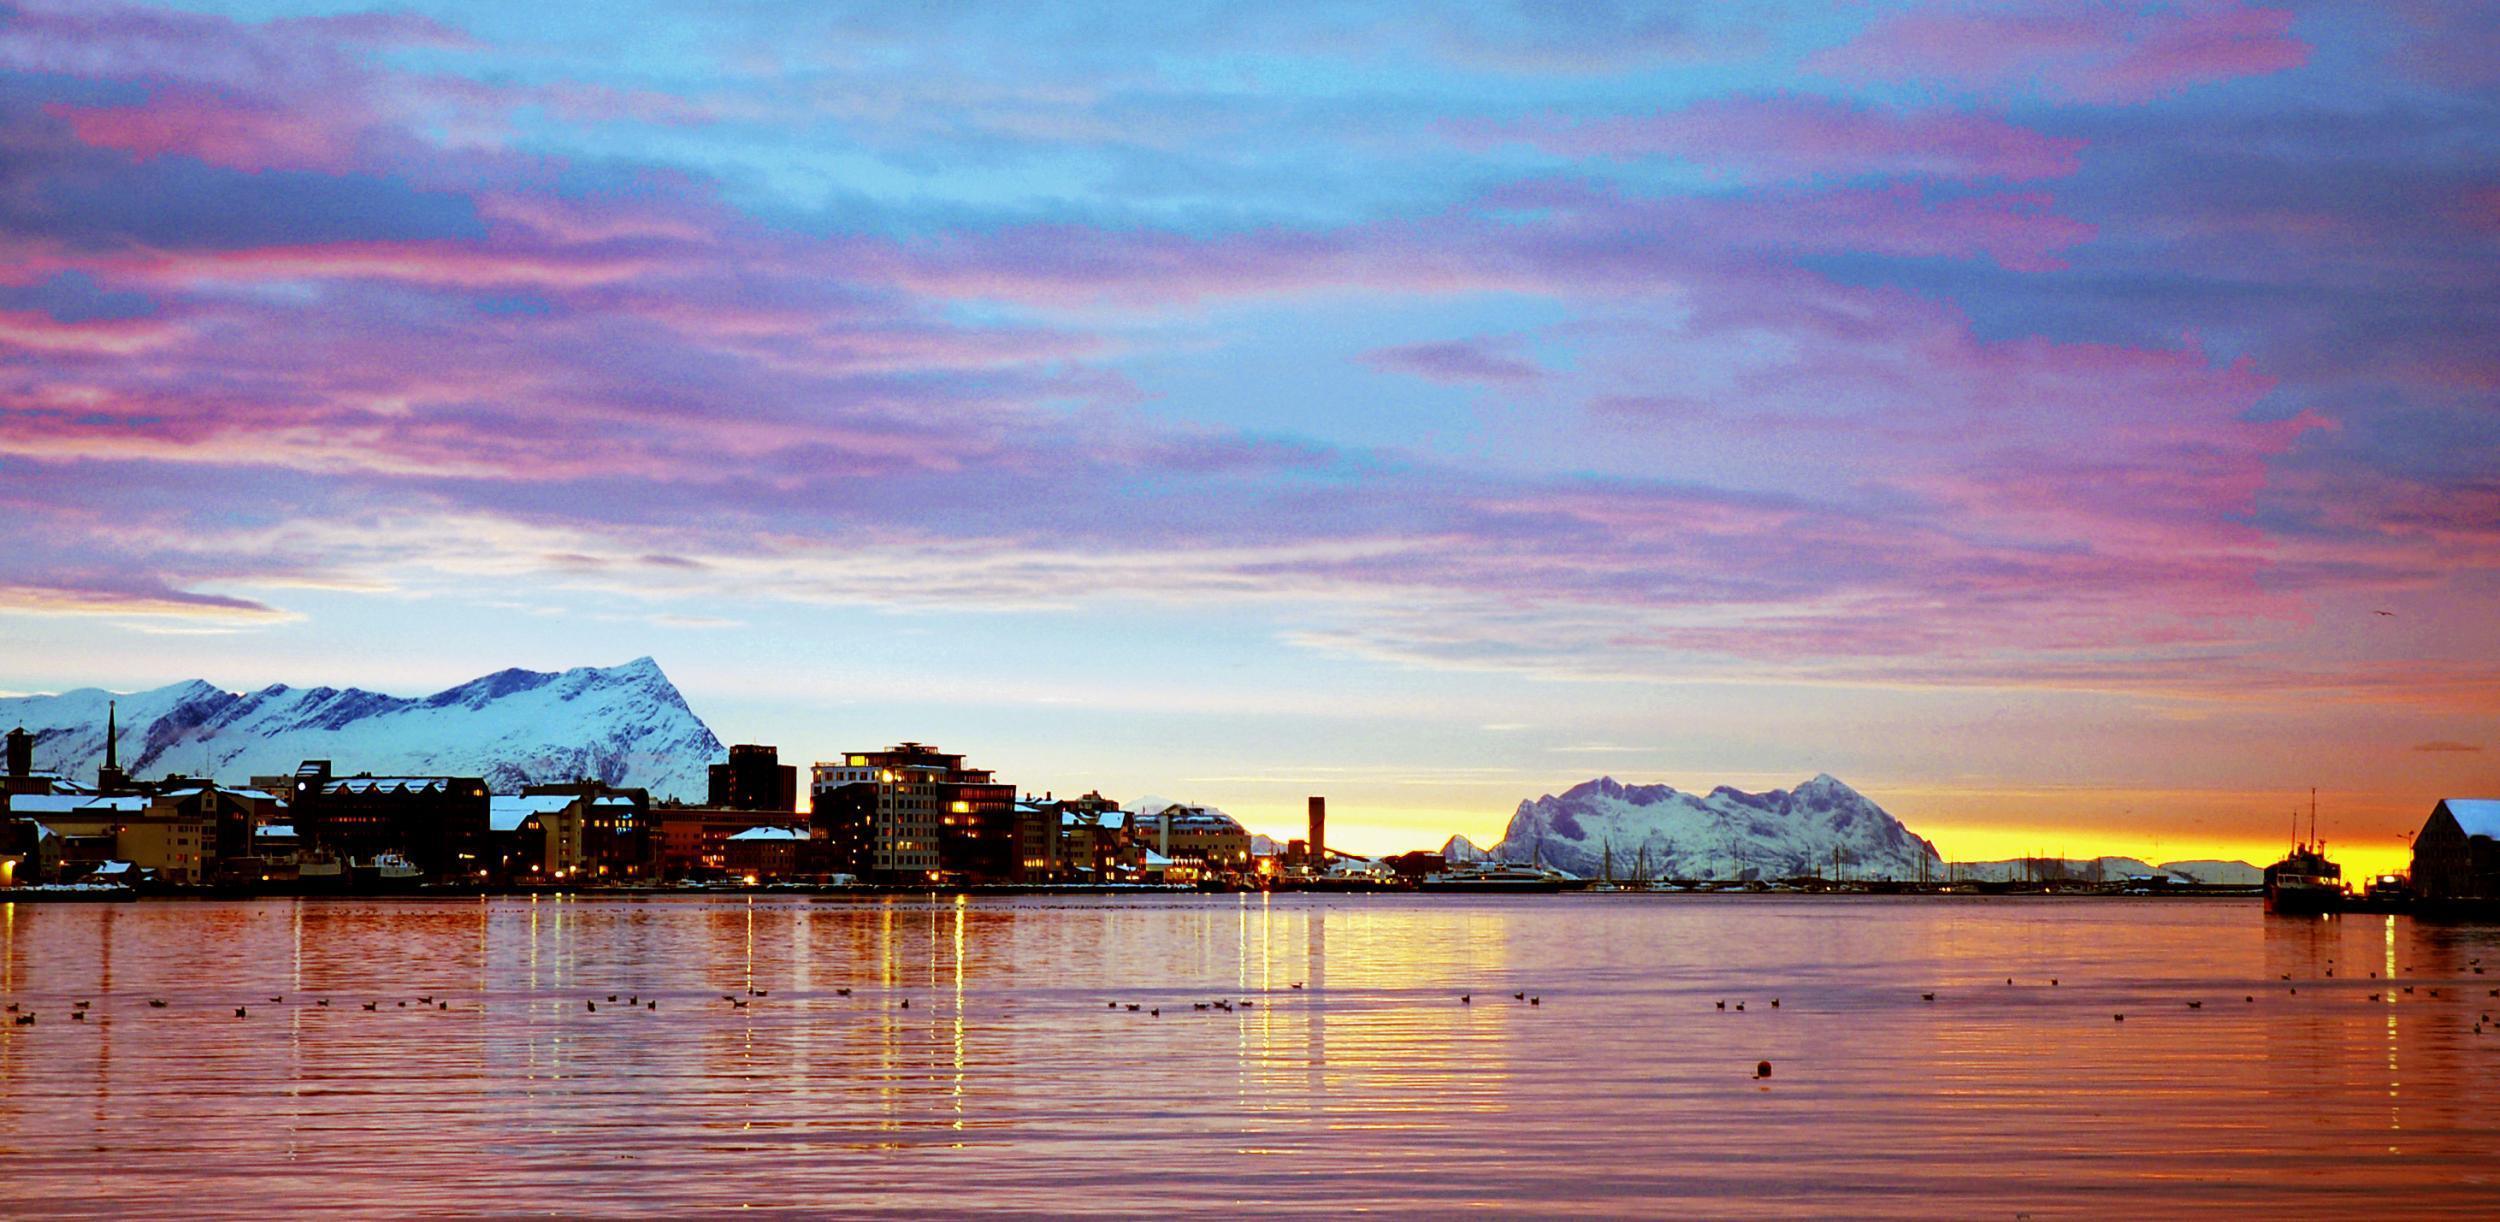 Time to take a break in Bodø